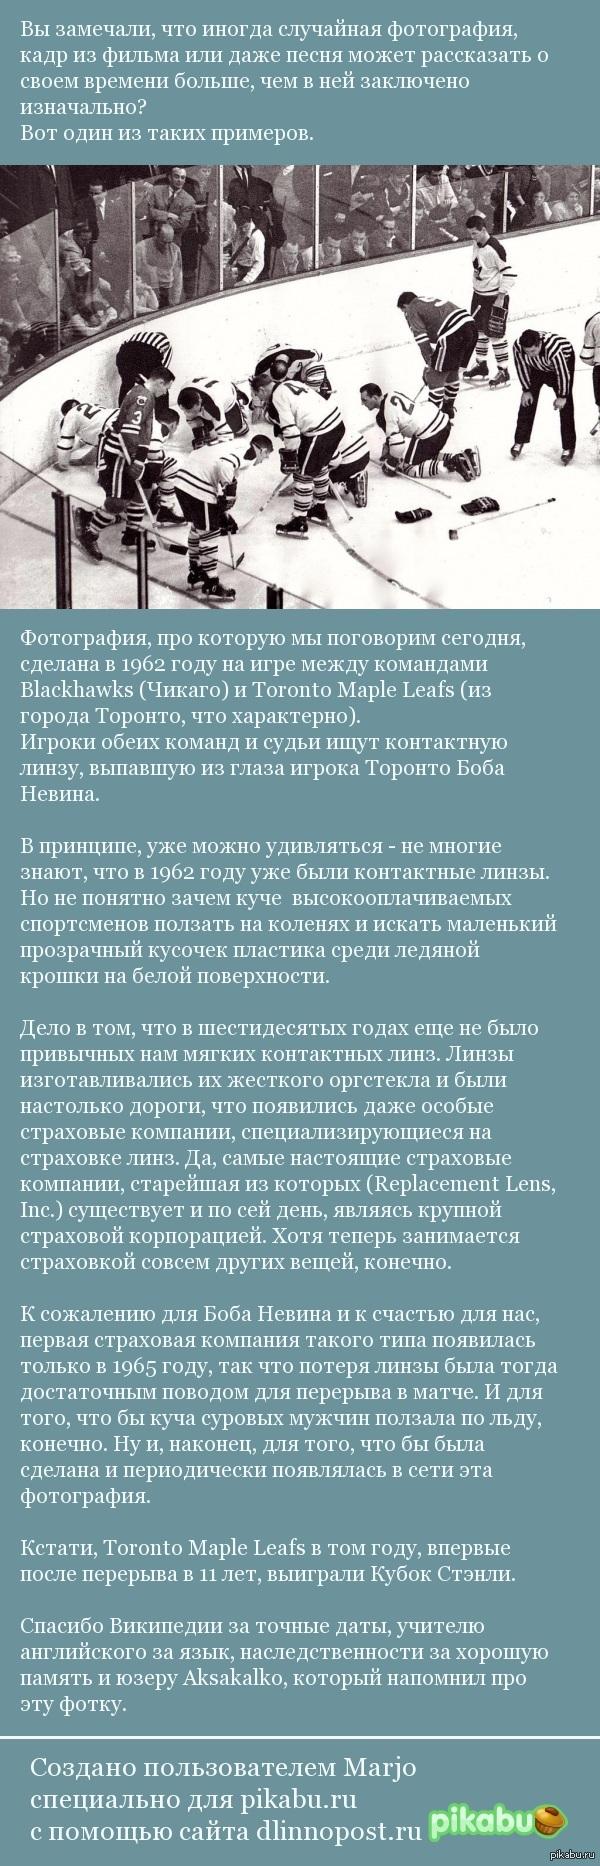 "Однажды на льду По следам петросянского поста <a href=""http://pikabu.ru/story/sluchay_na_khokkeynom_matche_2957263"">http://pikabu.ru/story/_2957263</a>"